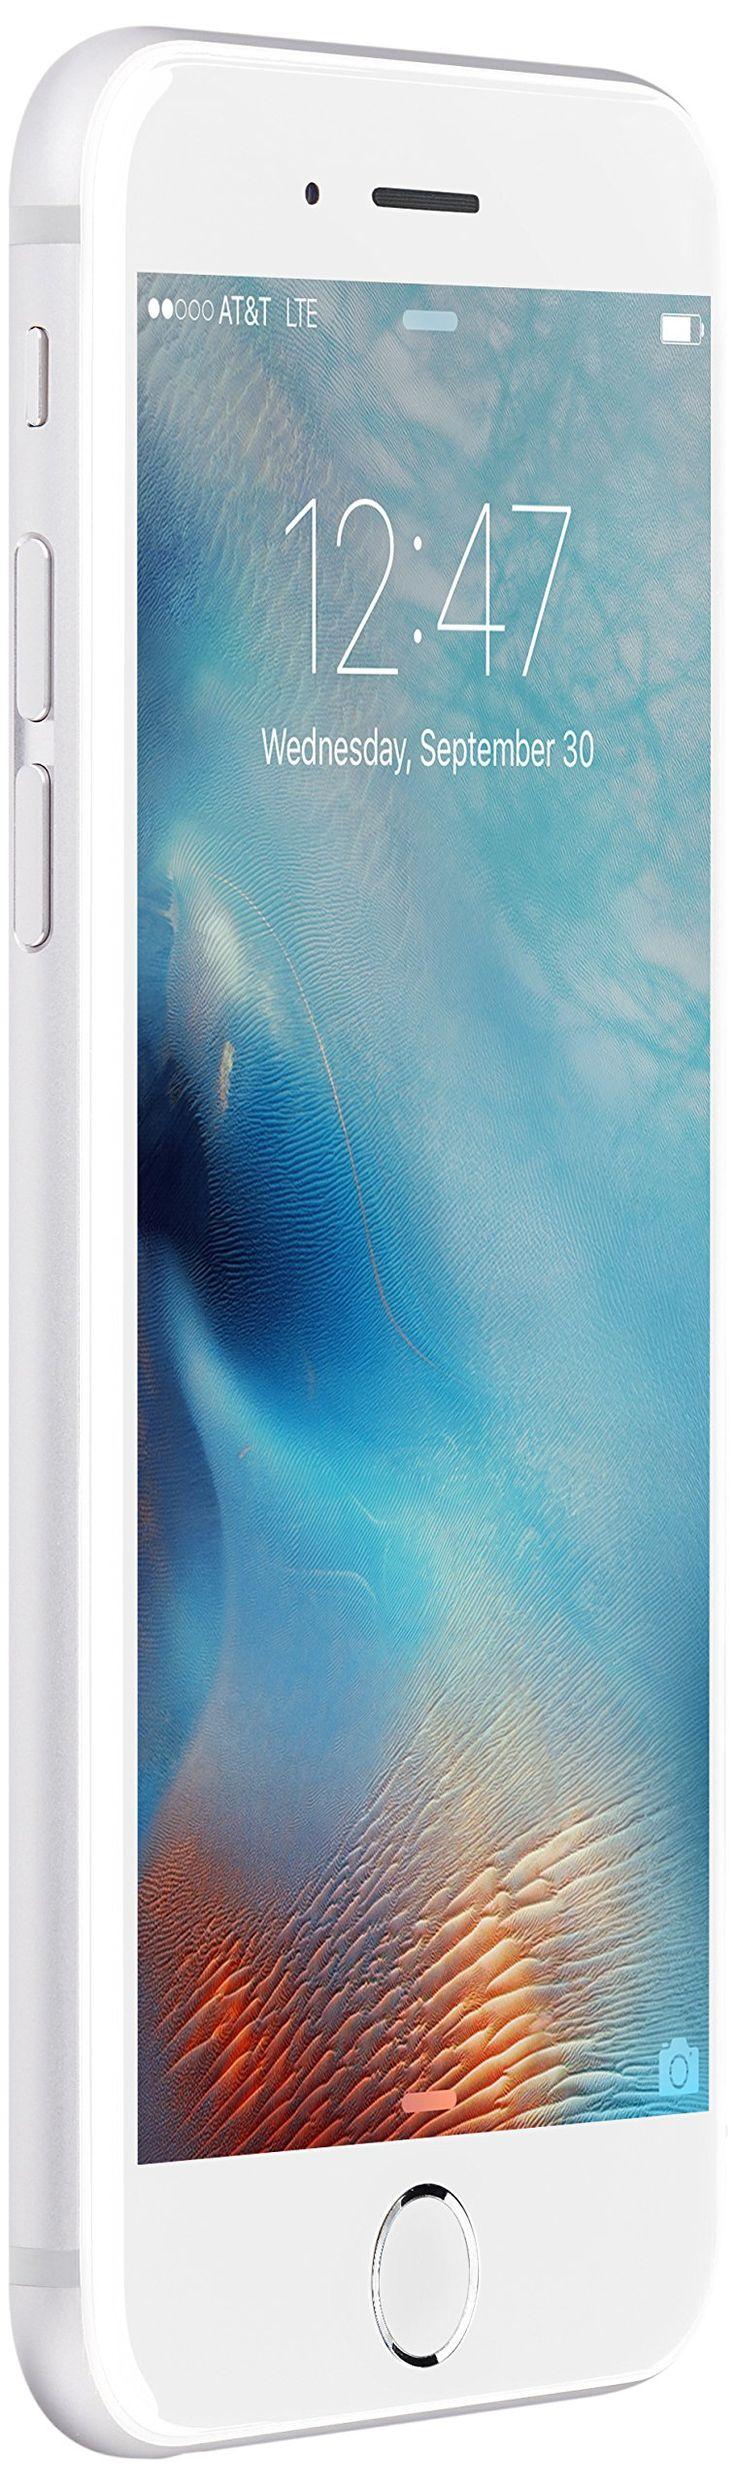 Apple iPhone 6S 64 GB Unlocked, Silver International Version